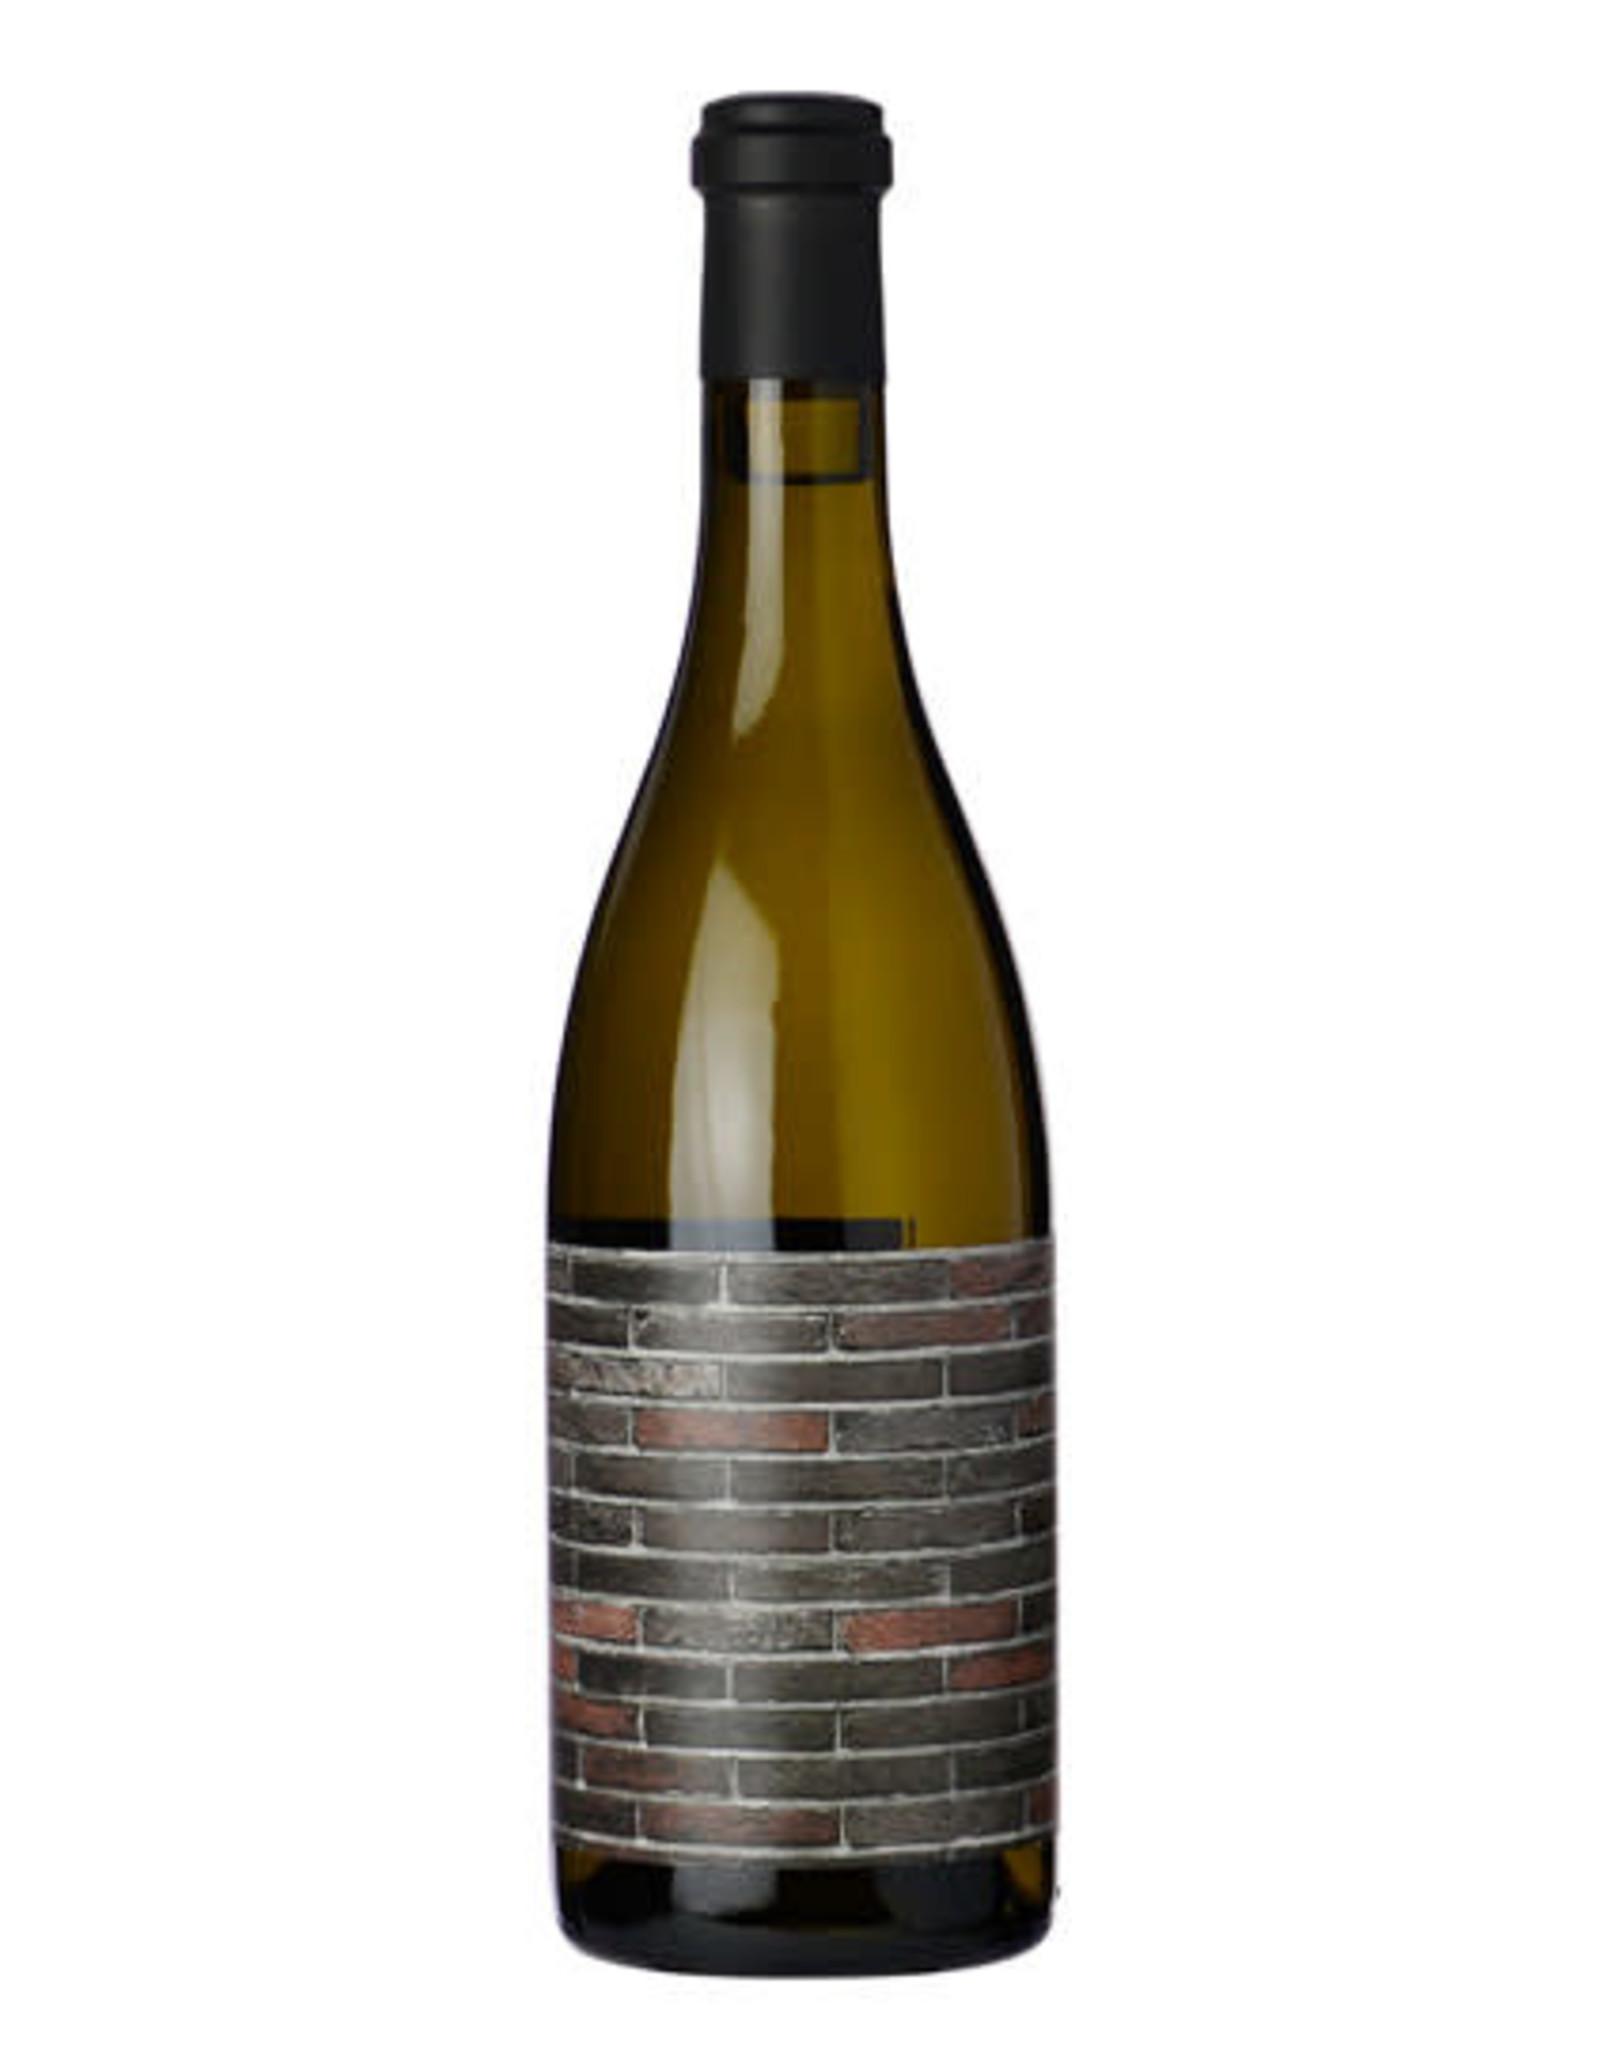 Brick & Mortar, Cougar Rock Chardonnay 2015